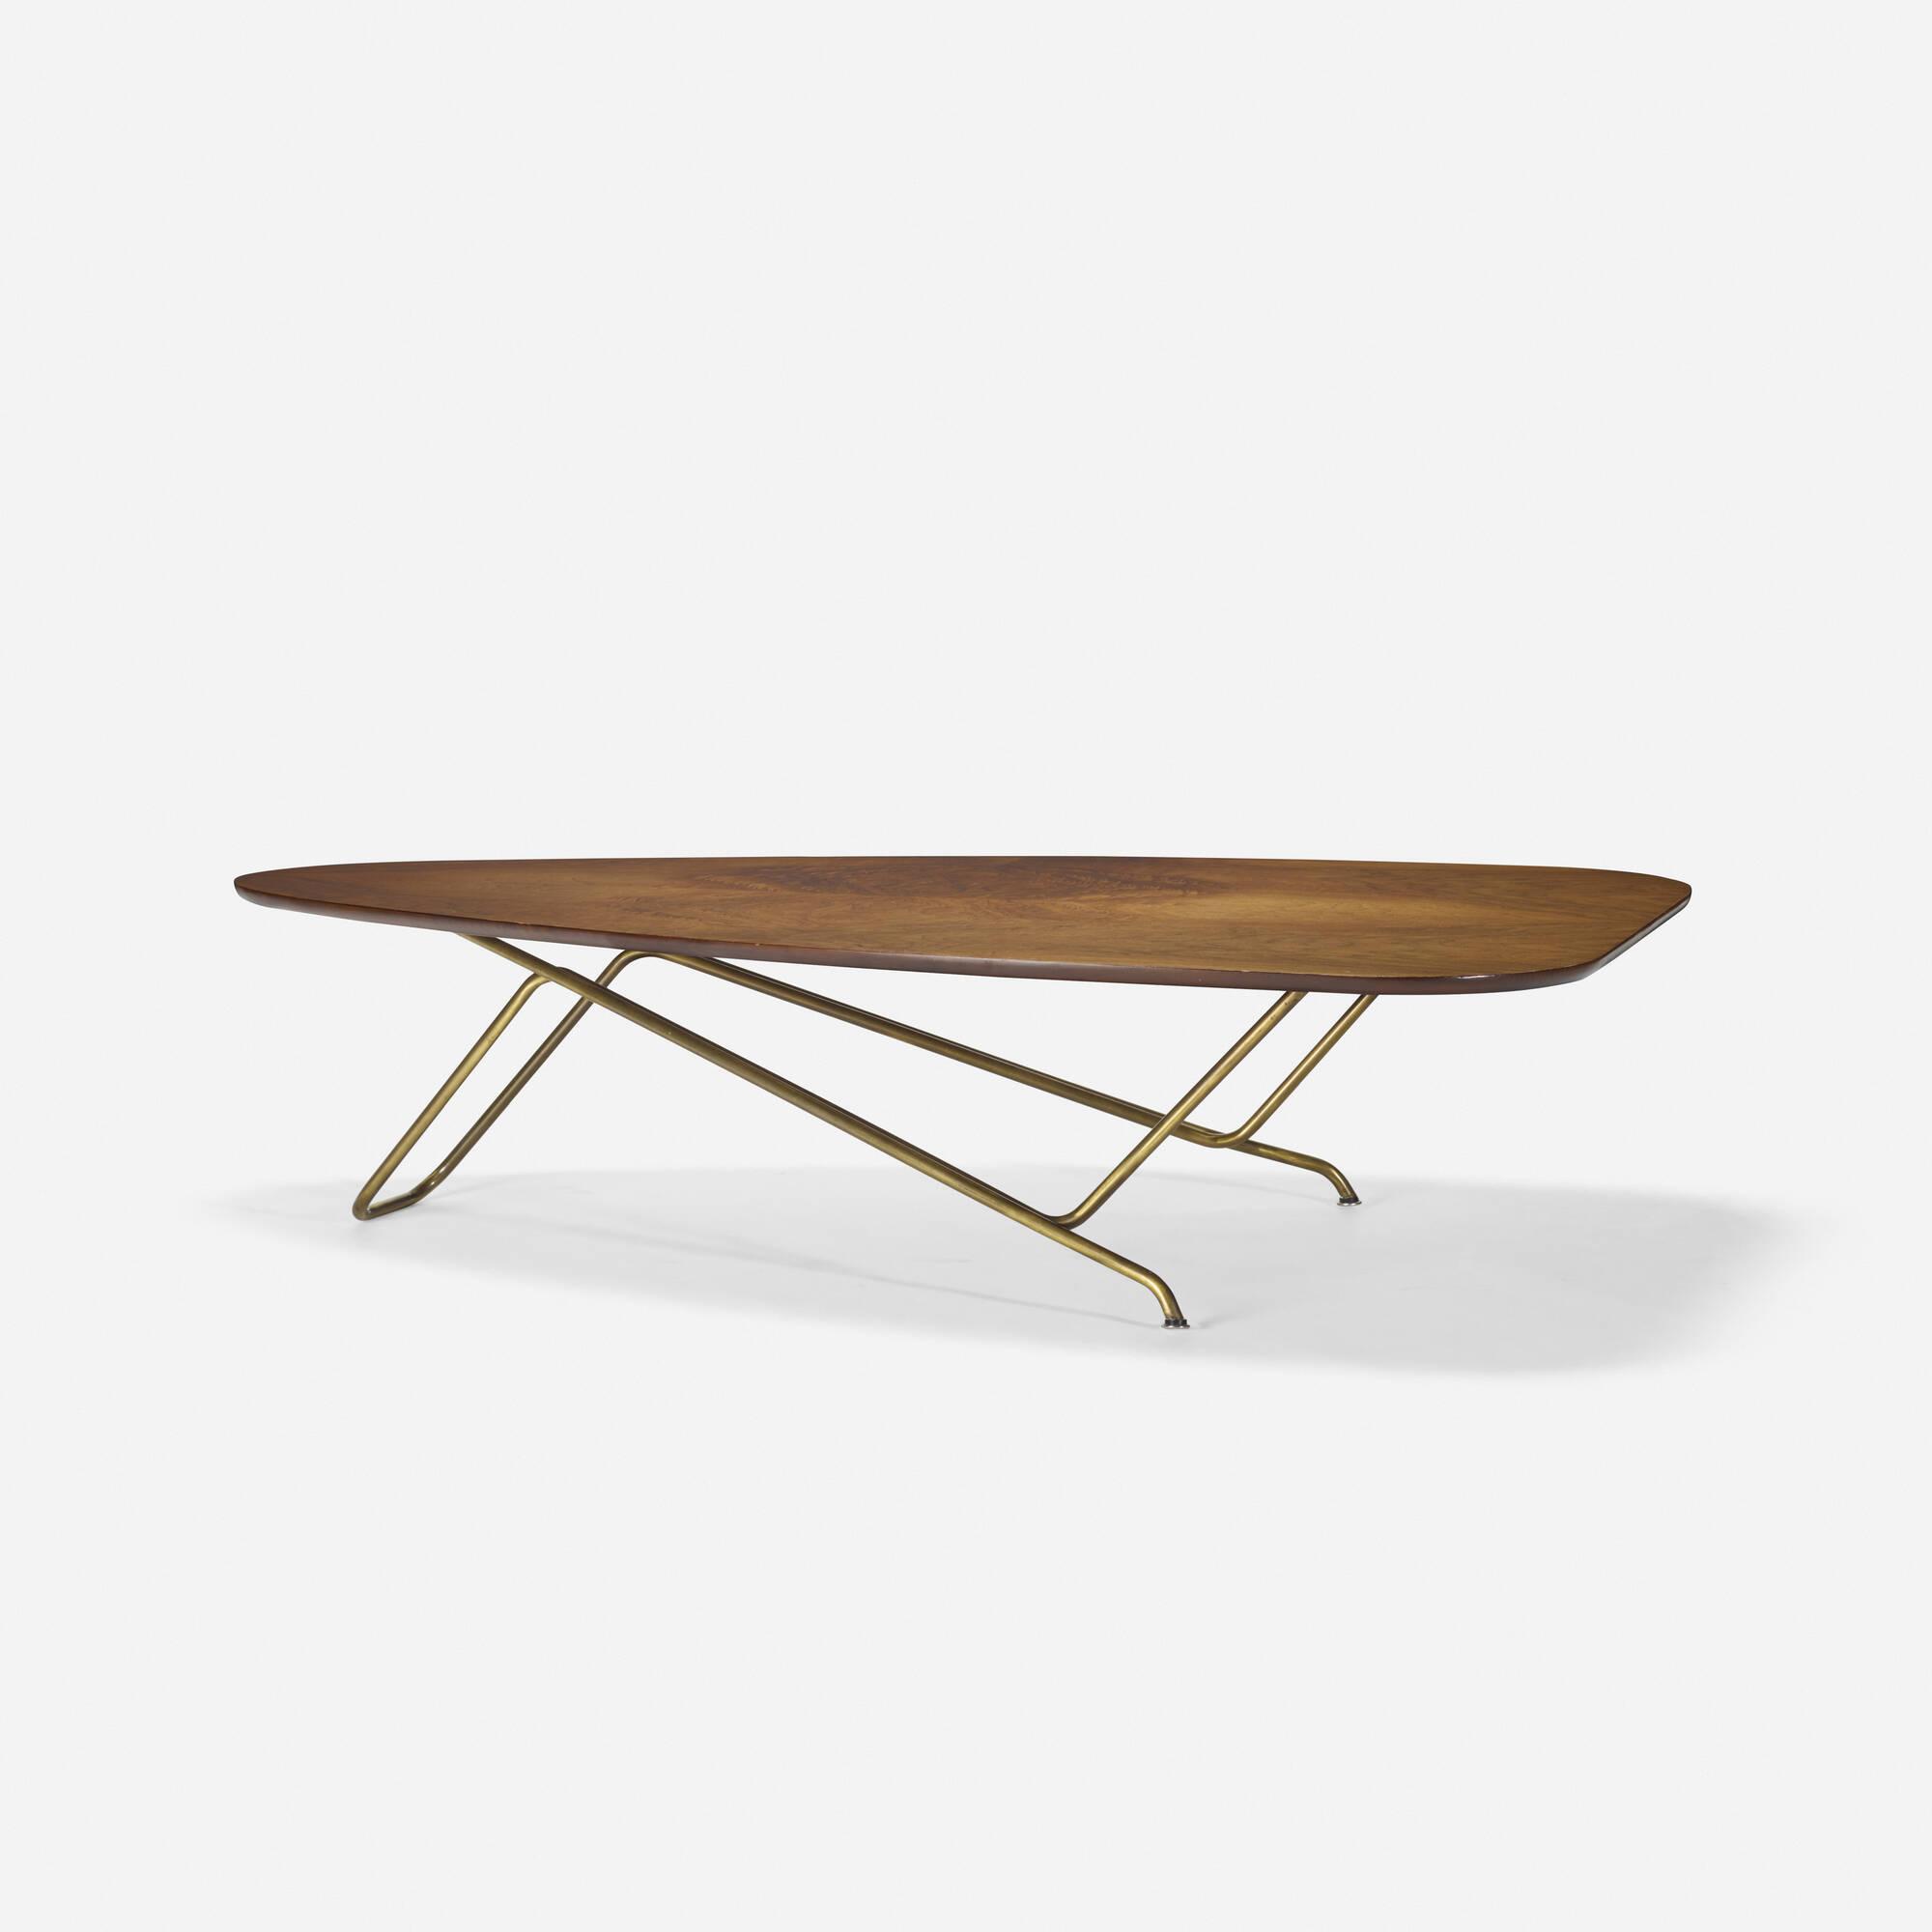 152 greta magnusson grossman coffee table design 26 october 152 greta magnusson grossman coffee table 2 of 4 geotapseo Gallery